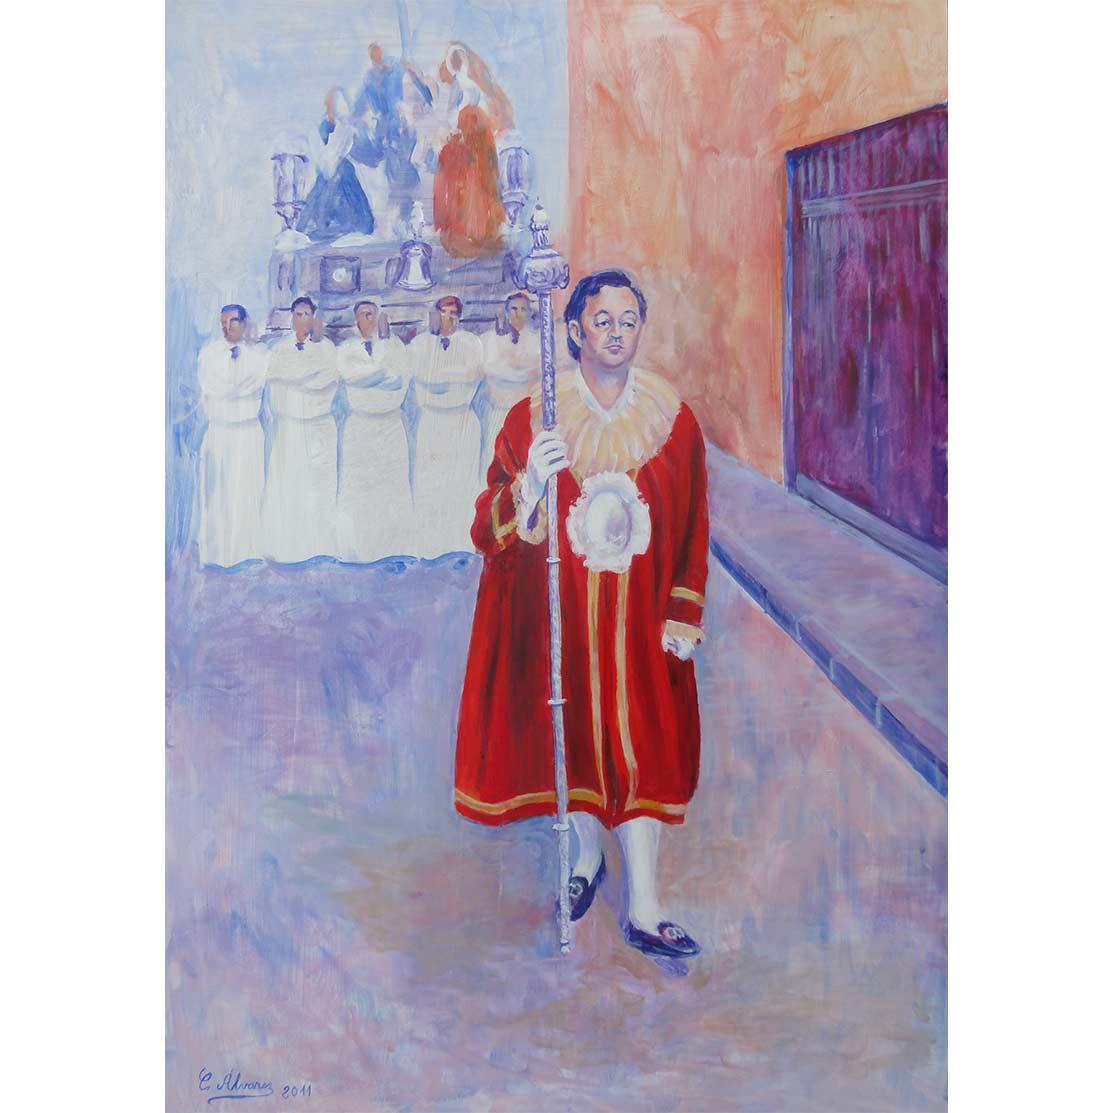 THE PERTIGUERO Acrylic on panel 60 x 40 cm